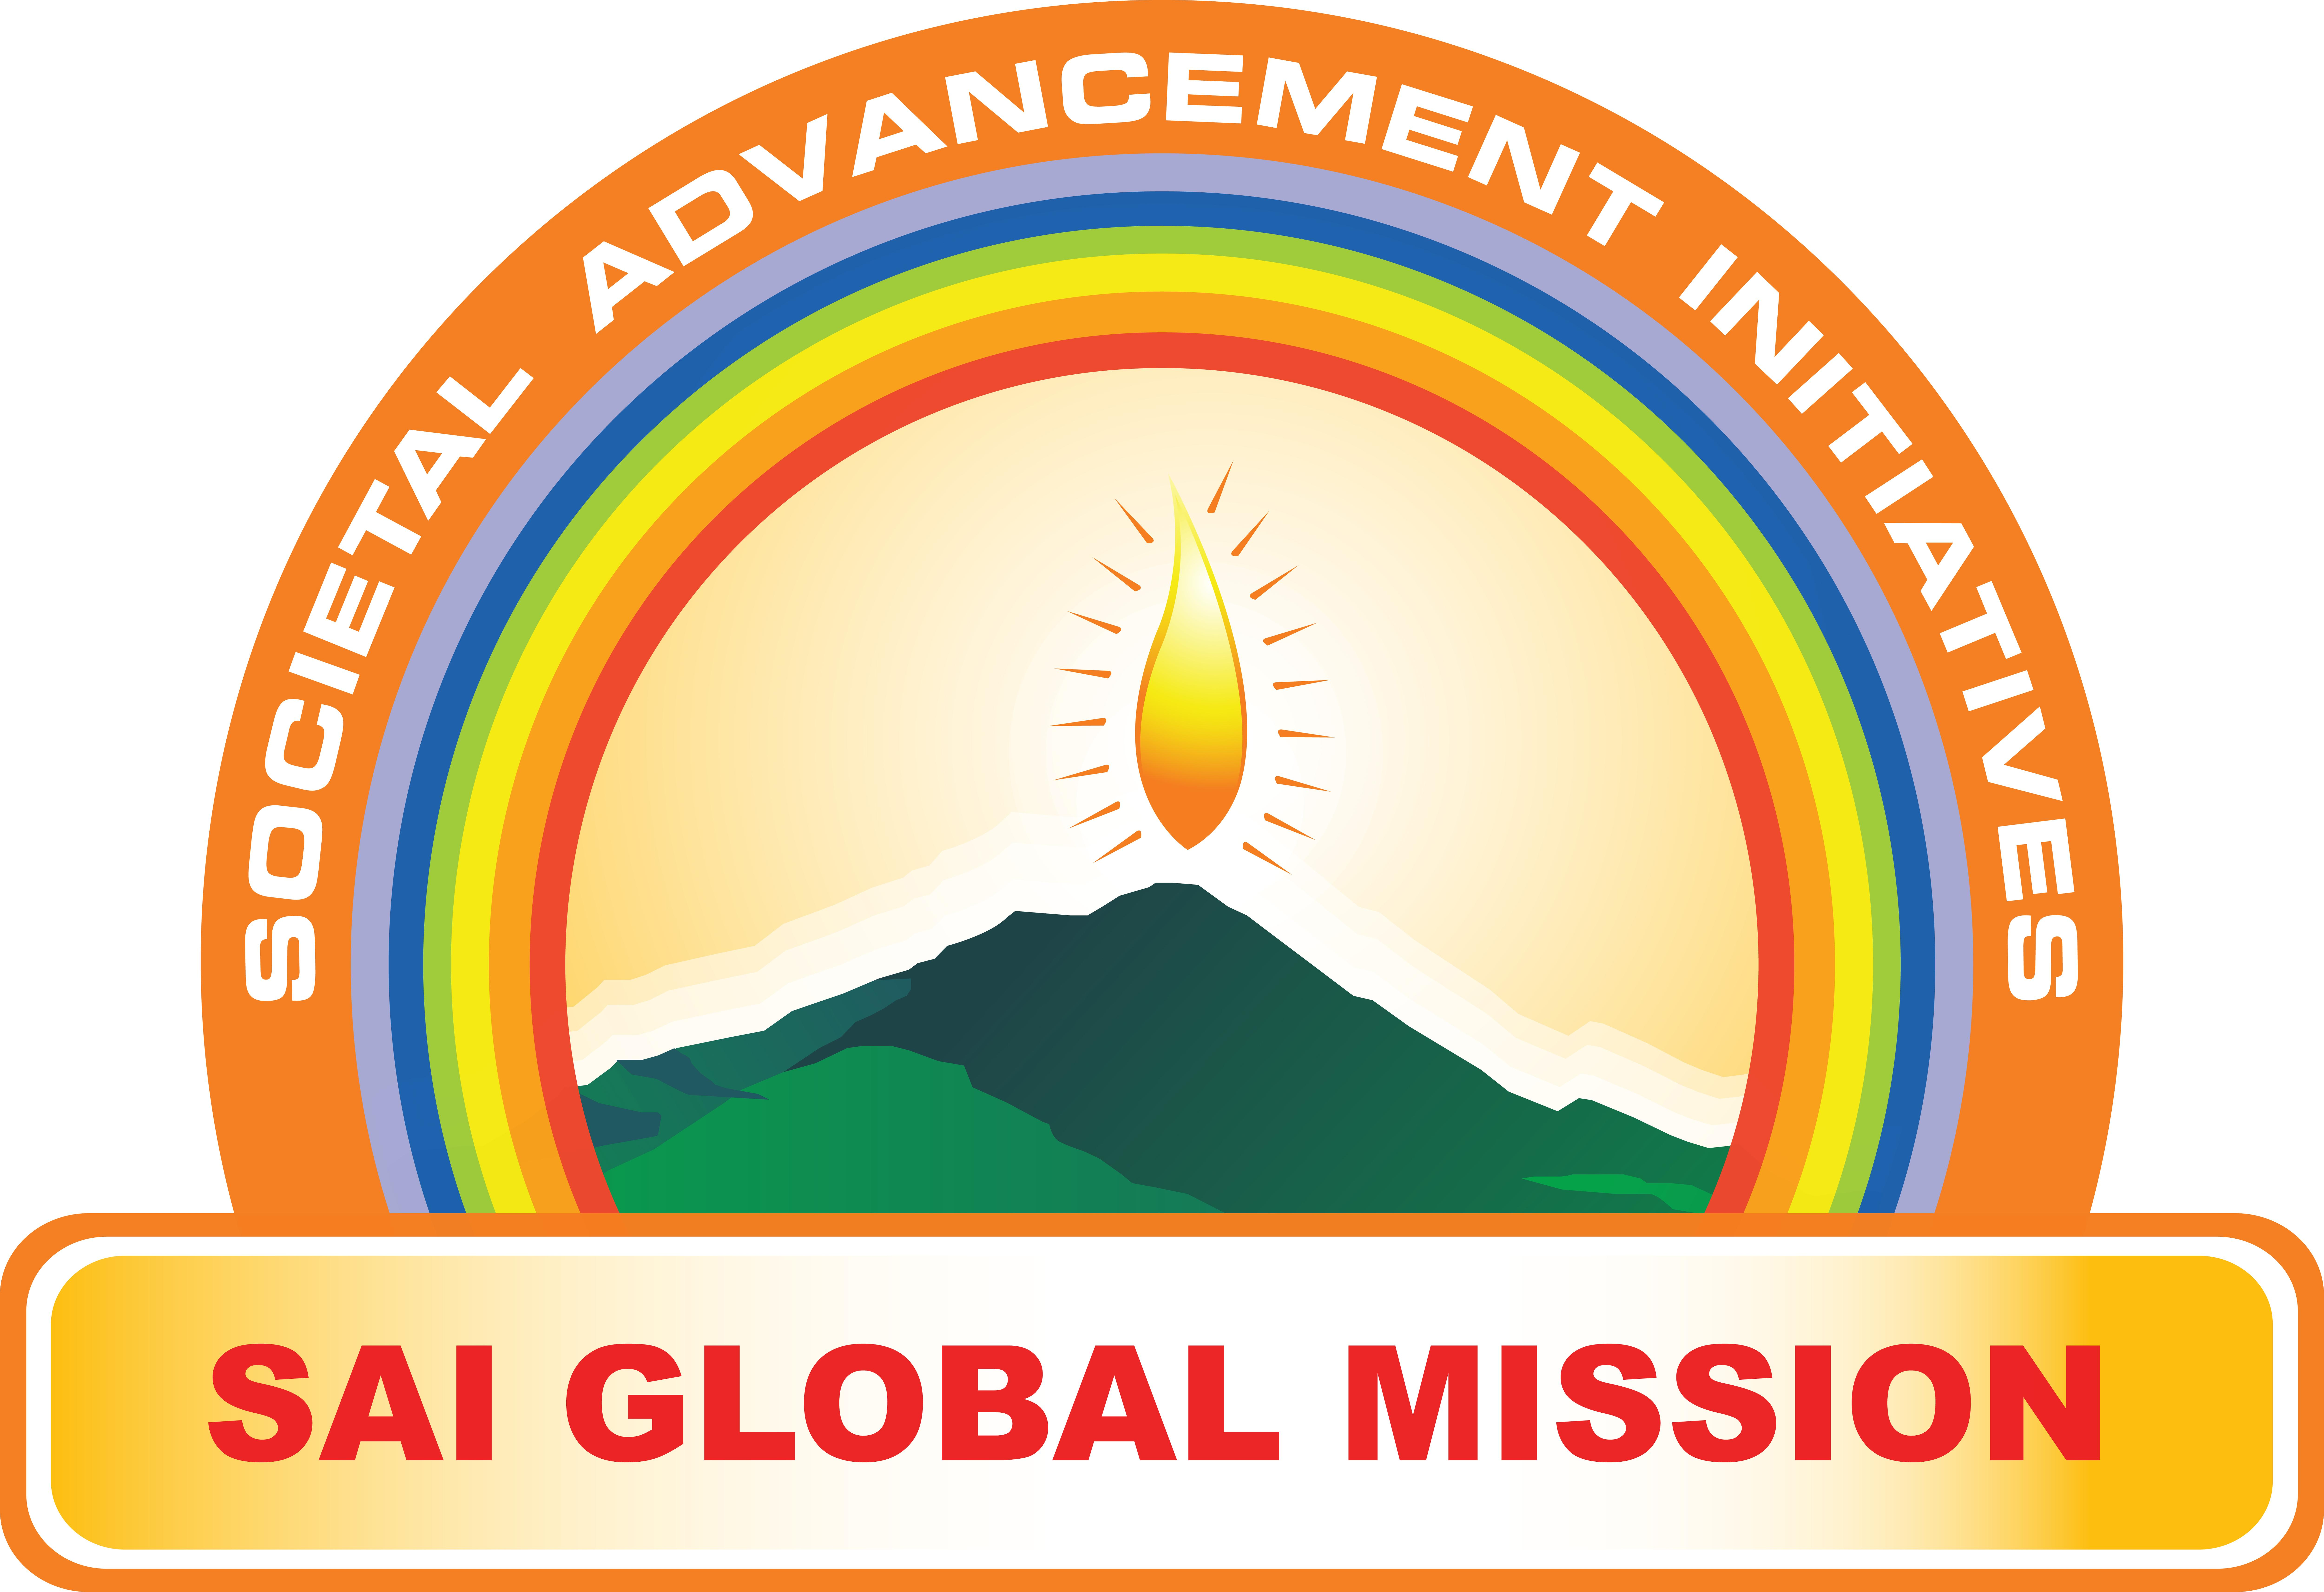 Sai Global Mission